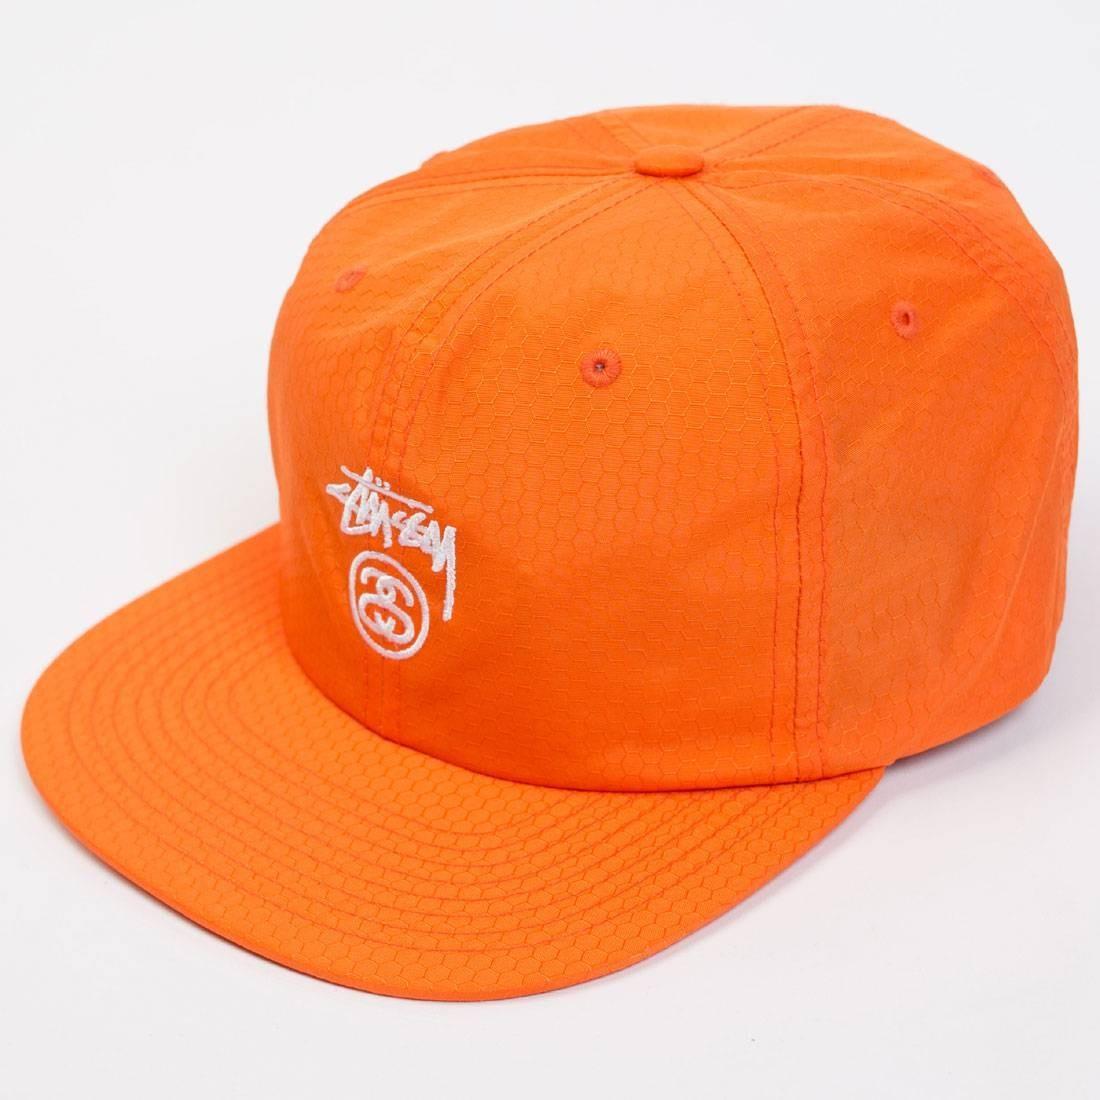 Stussy Stock Lock Honeycomb Strapback Cap (orange)